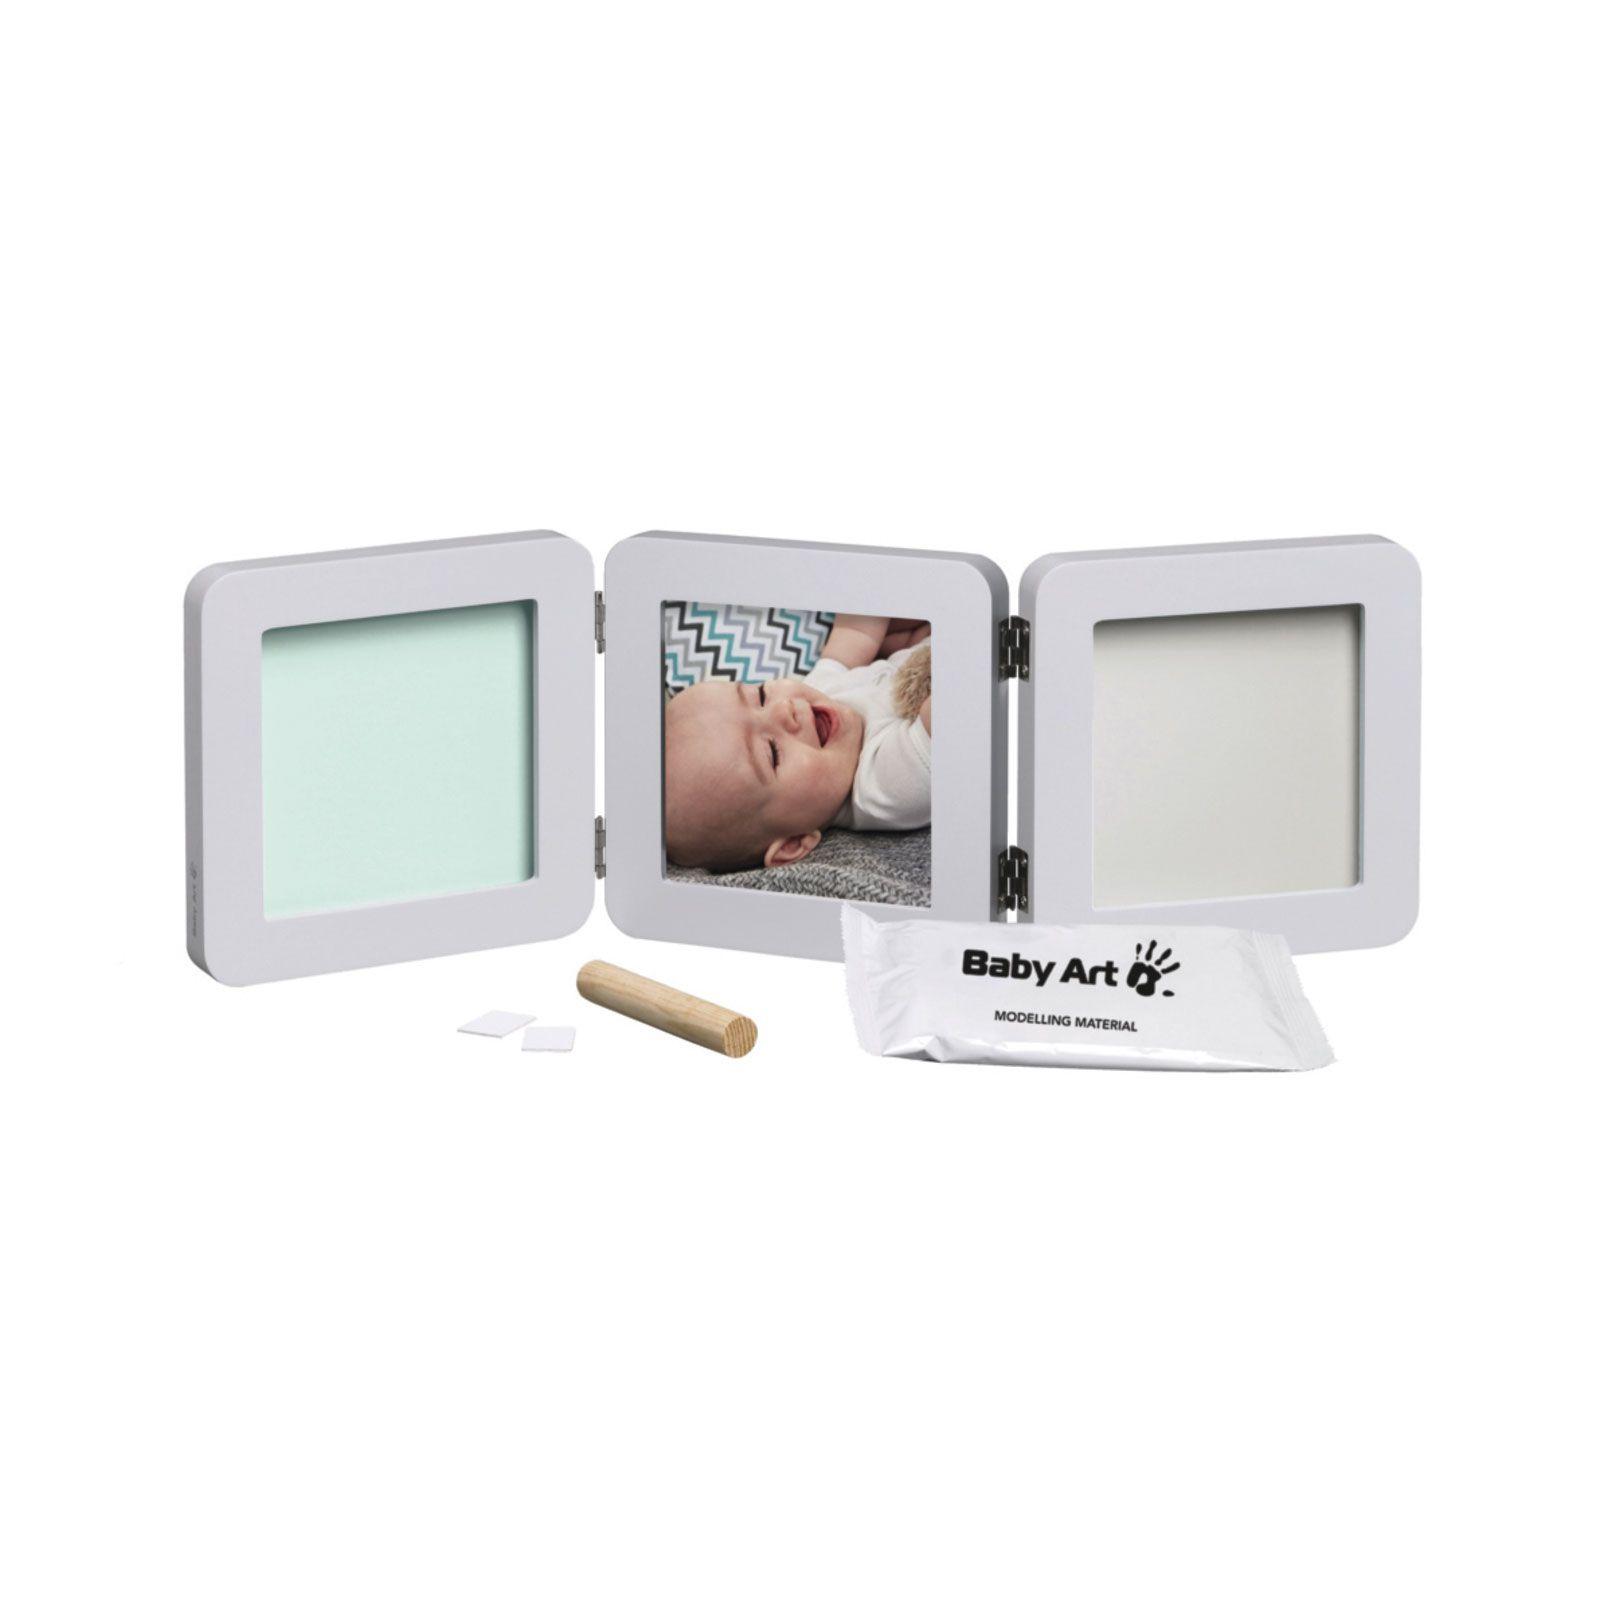 Baby Art Touch Triplo 1p Pastel - Dorel Ref Imp91438